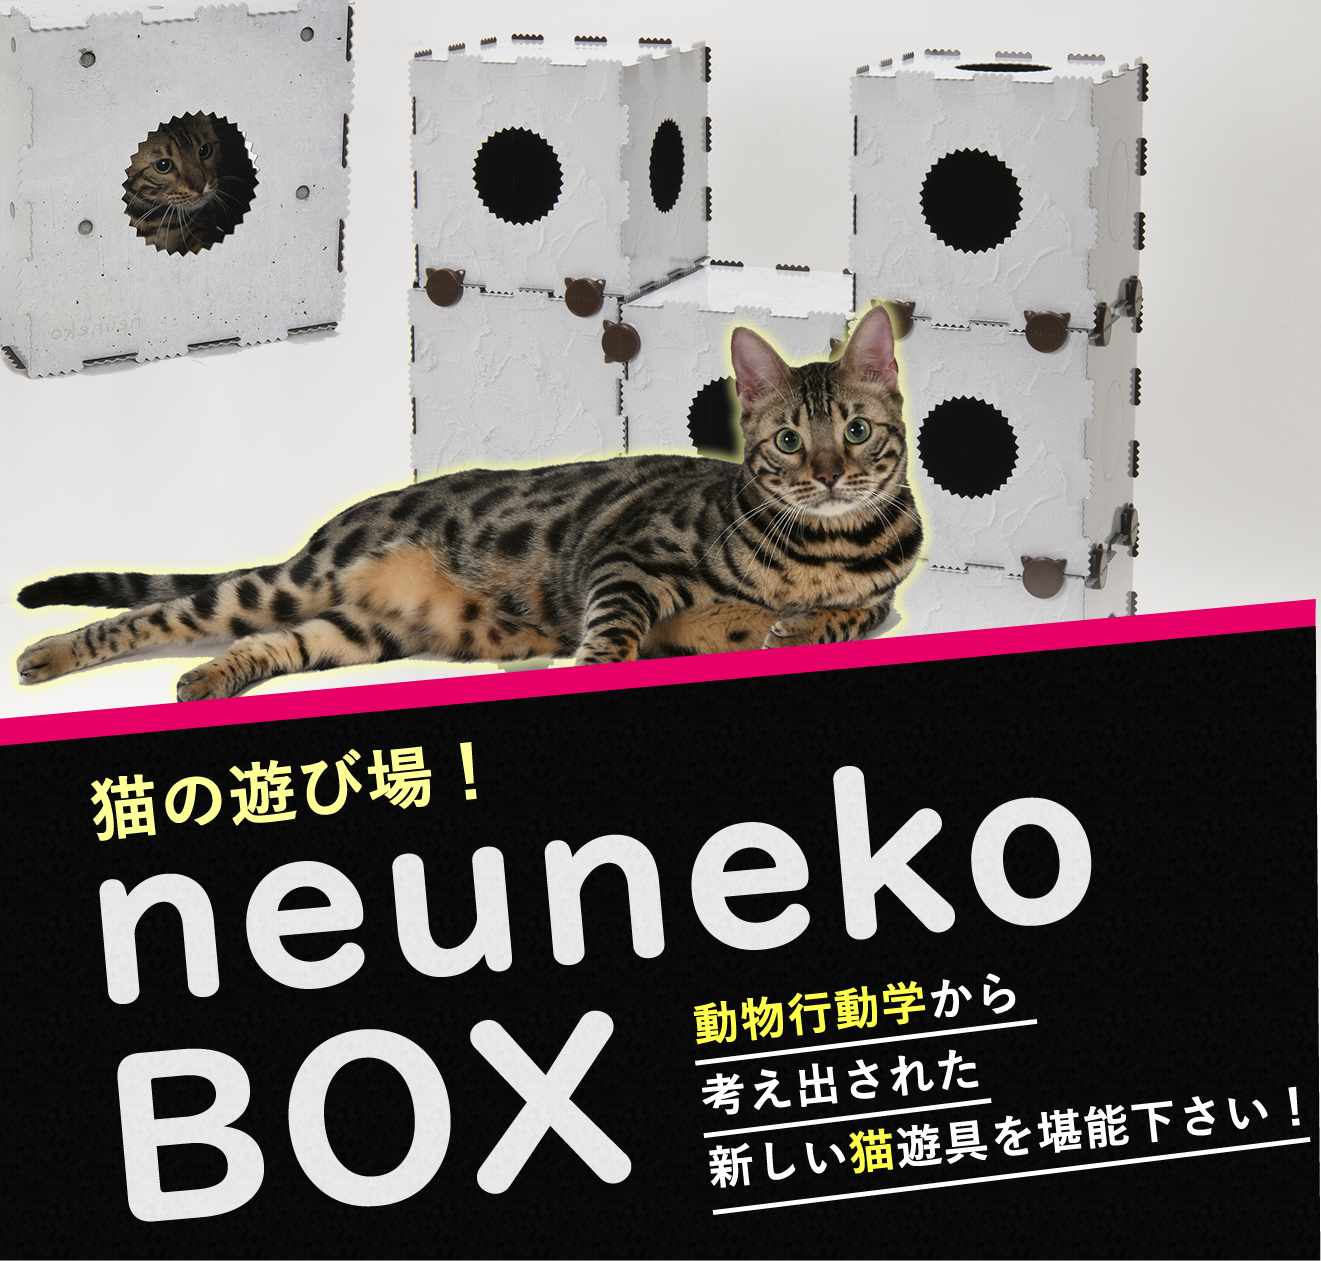 猫の遊び場 neunekoBOX